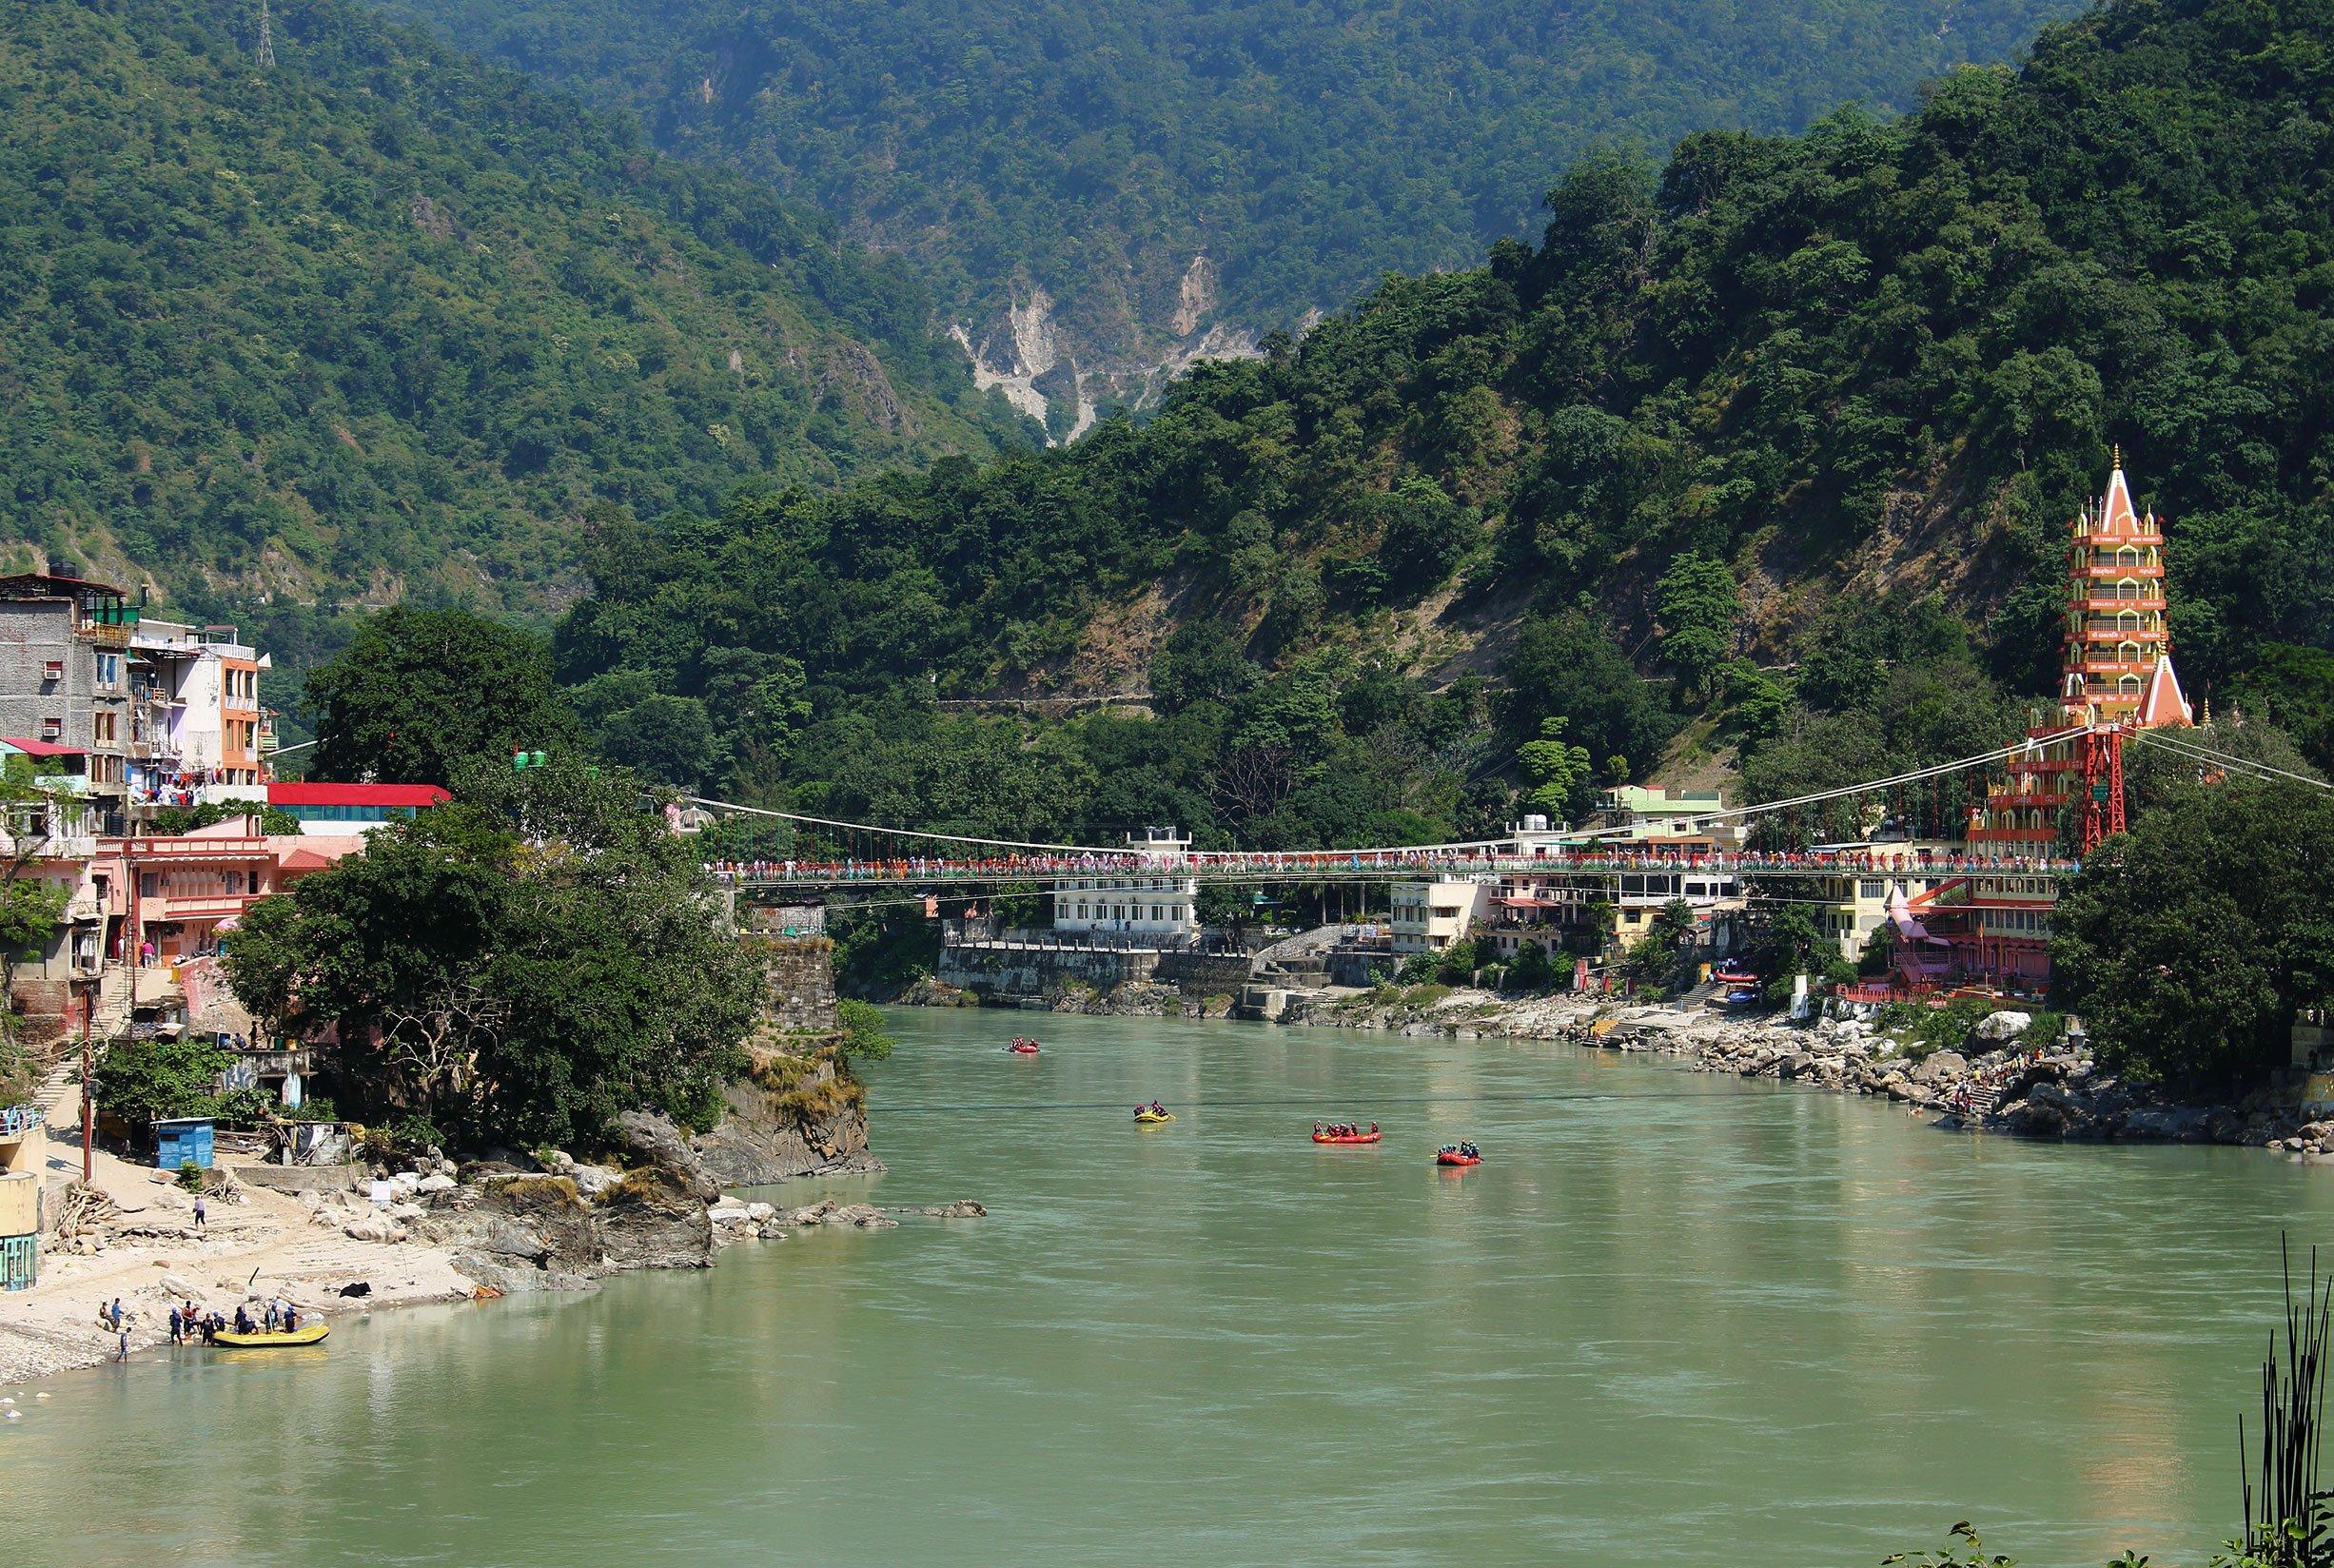 Rishikesh River in India